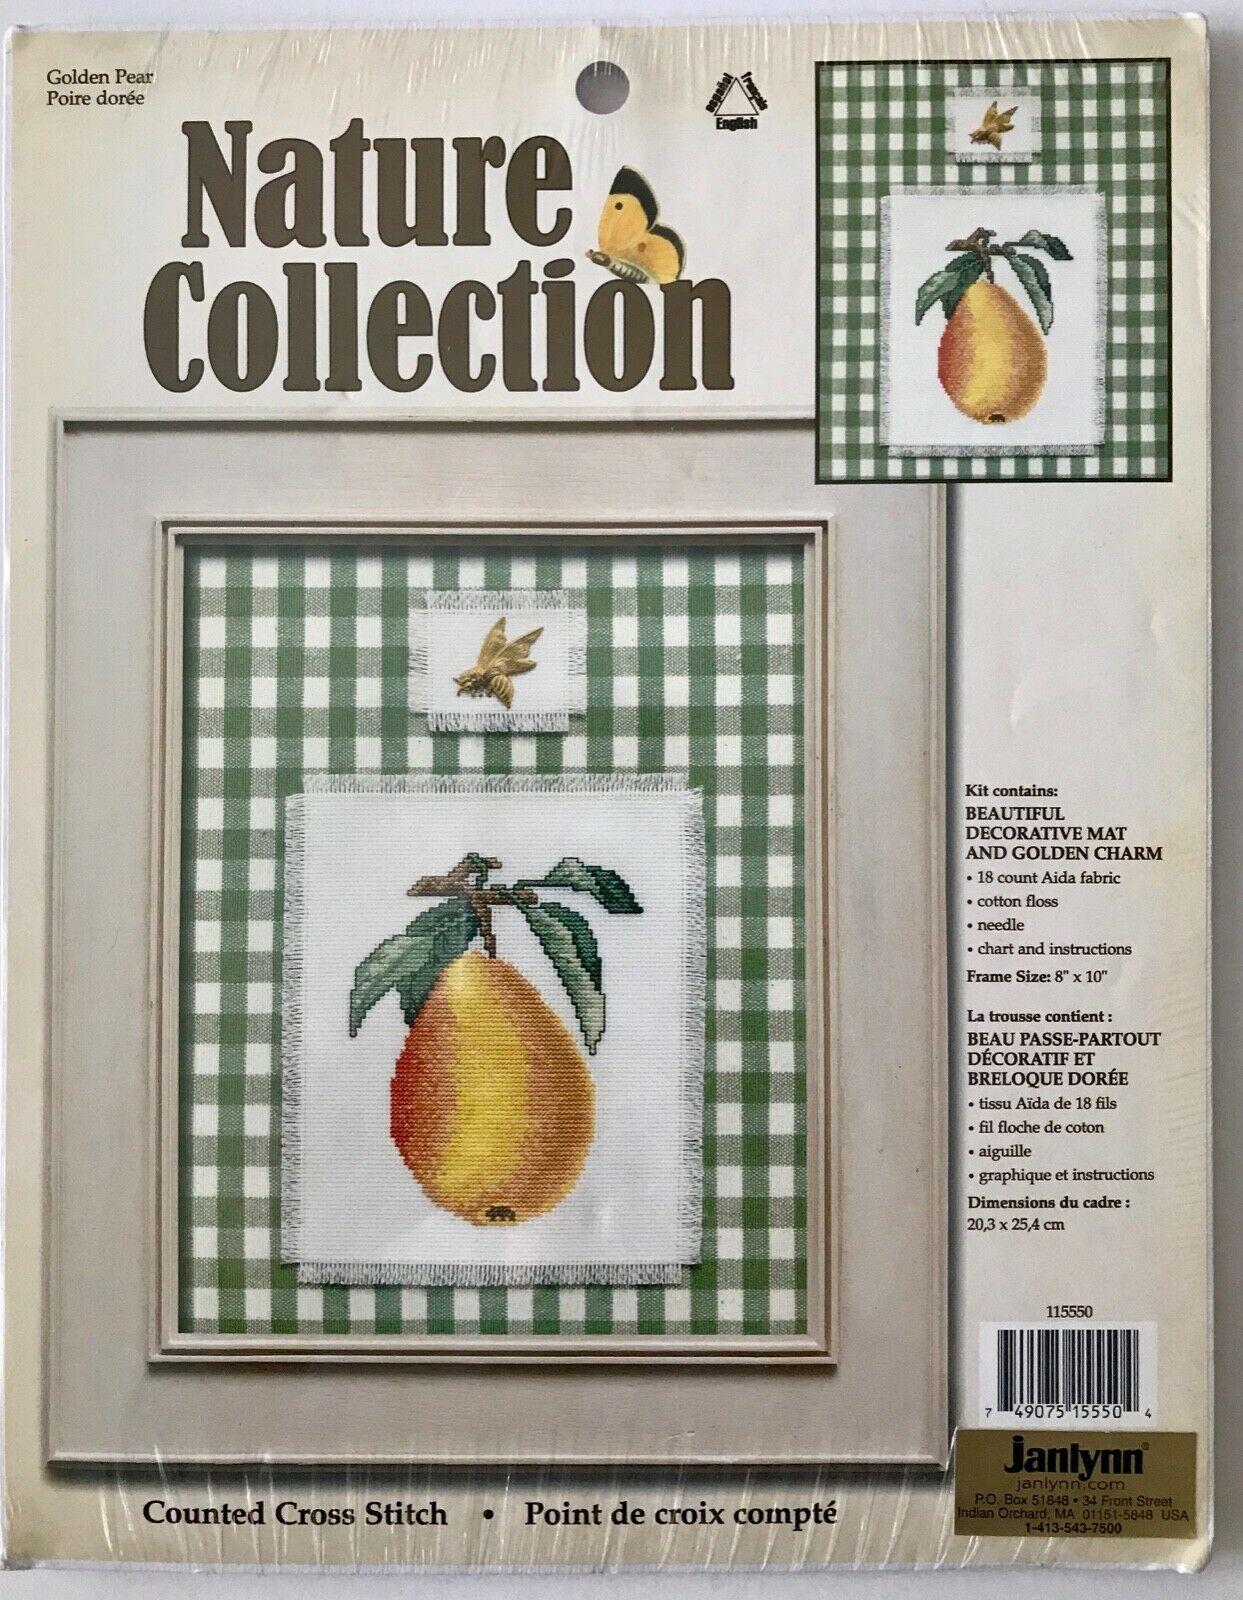 Janlynn Golden Pear Counted Cross Stitch Kit 115550 + Golden Bee Charm 2002 NIP